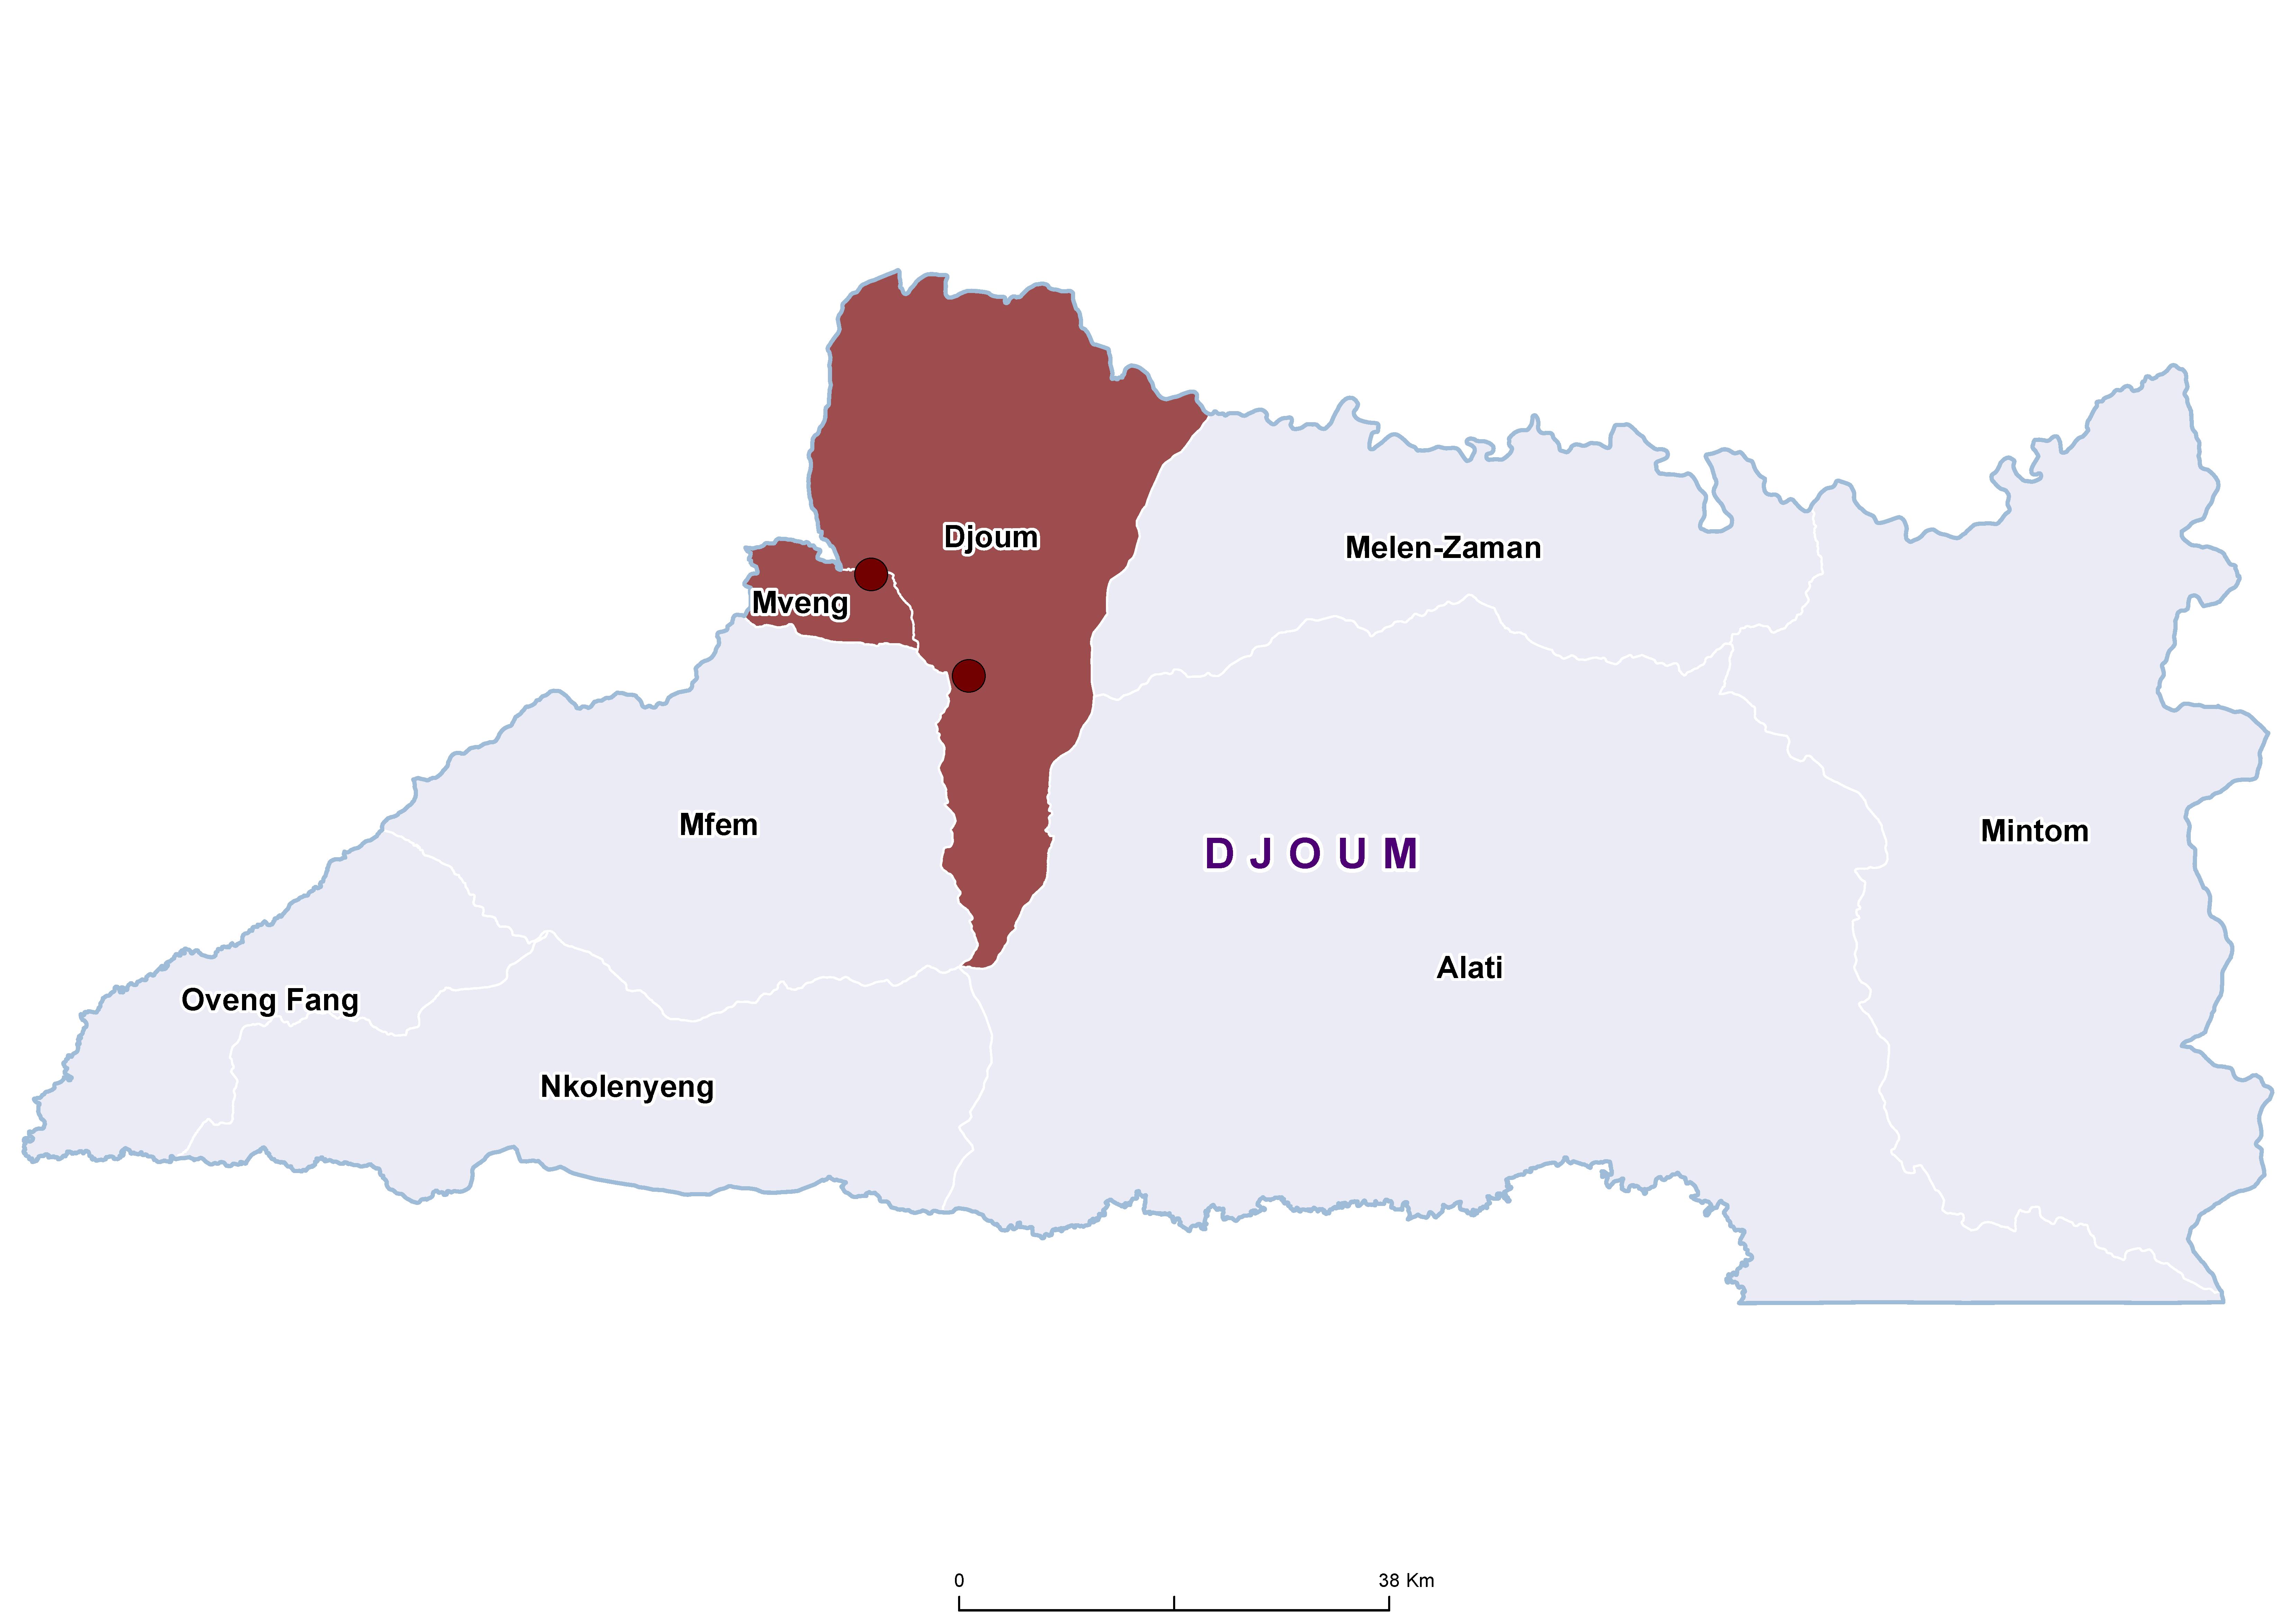 Djoum STH 19850001